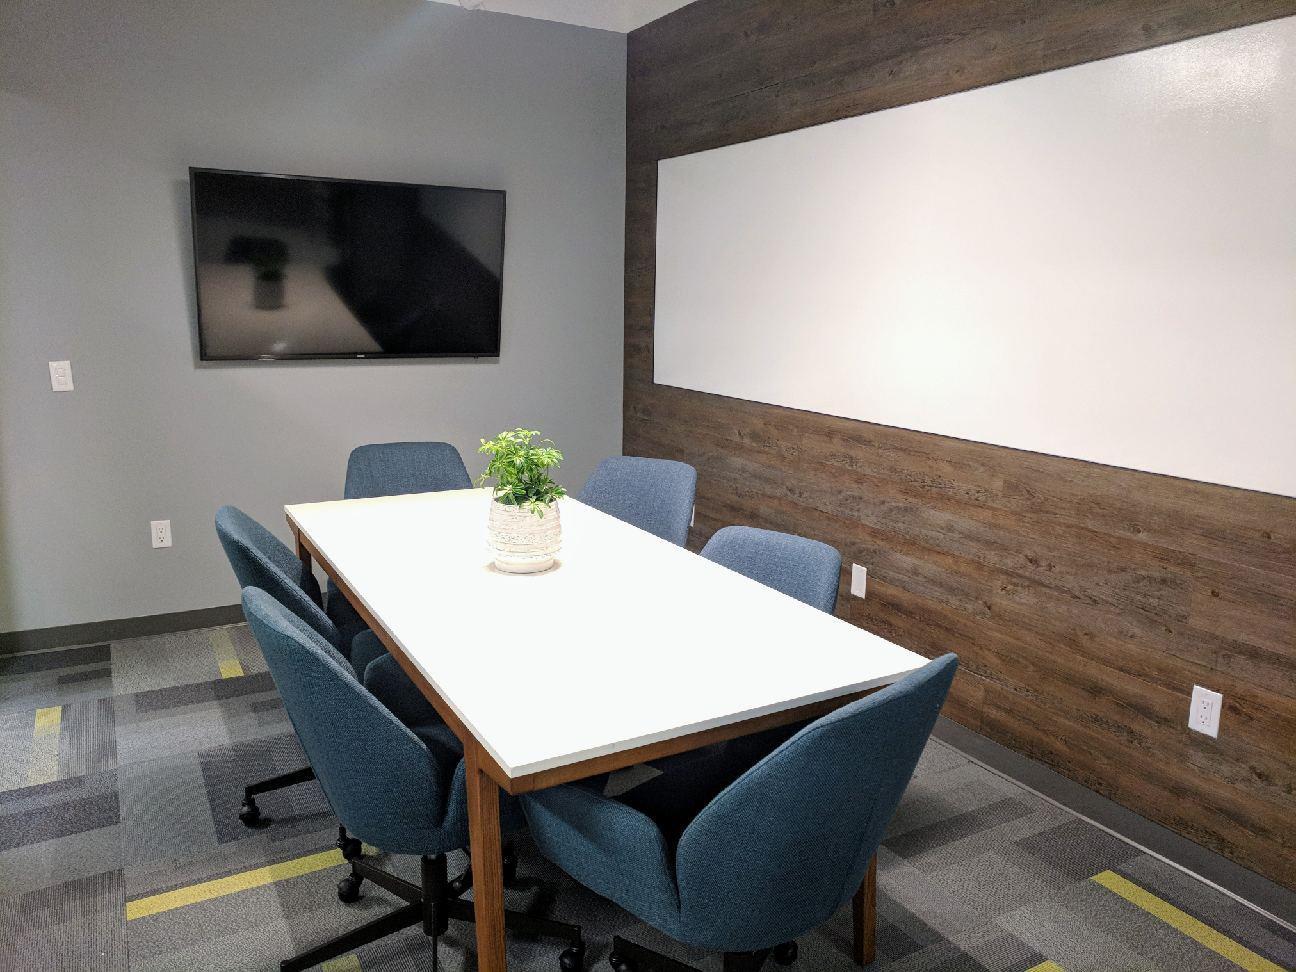 IgnitedSpaces-East St. - Medium Conference Room